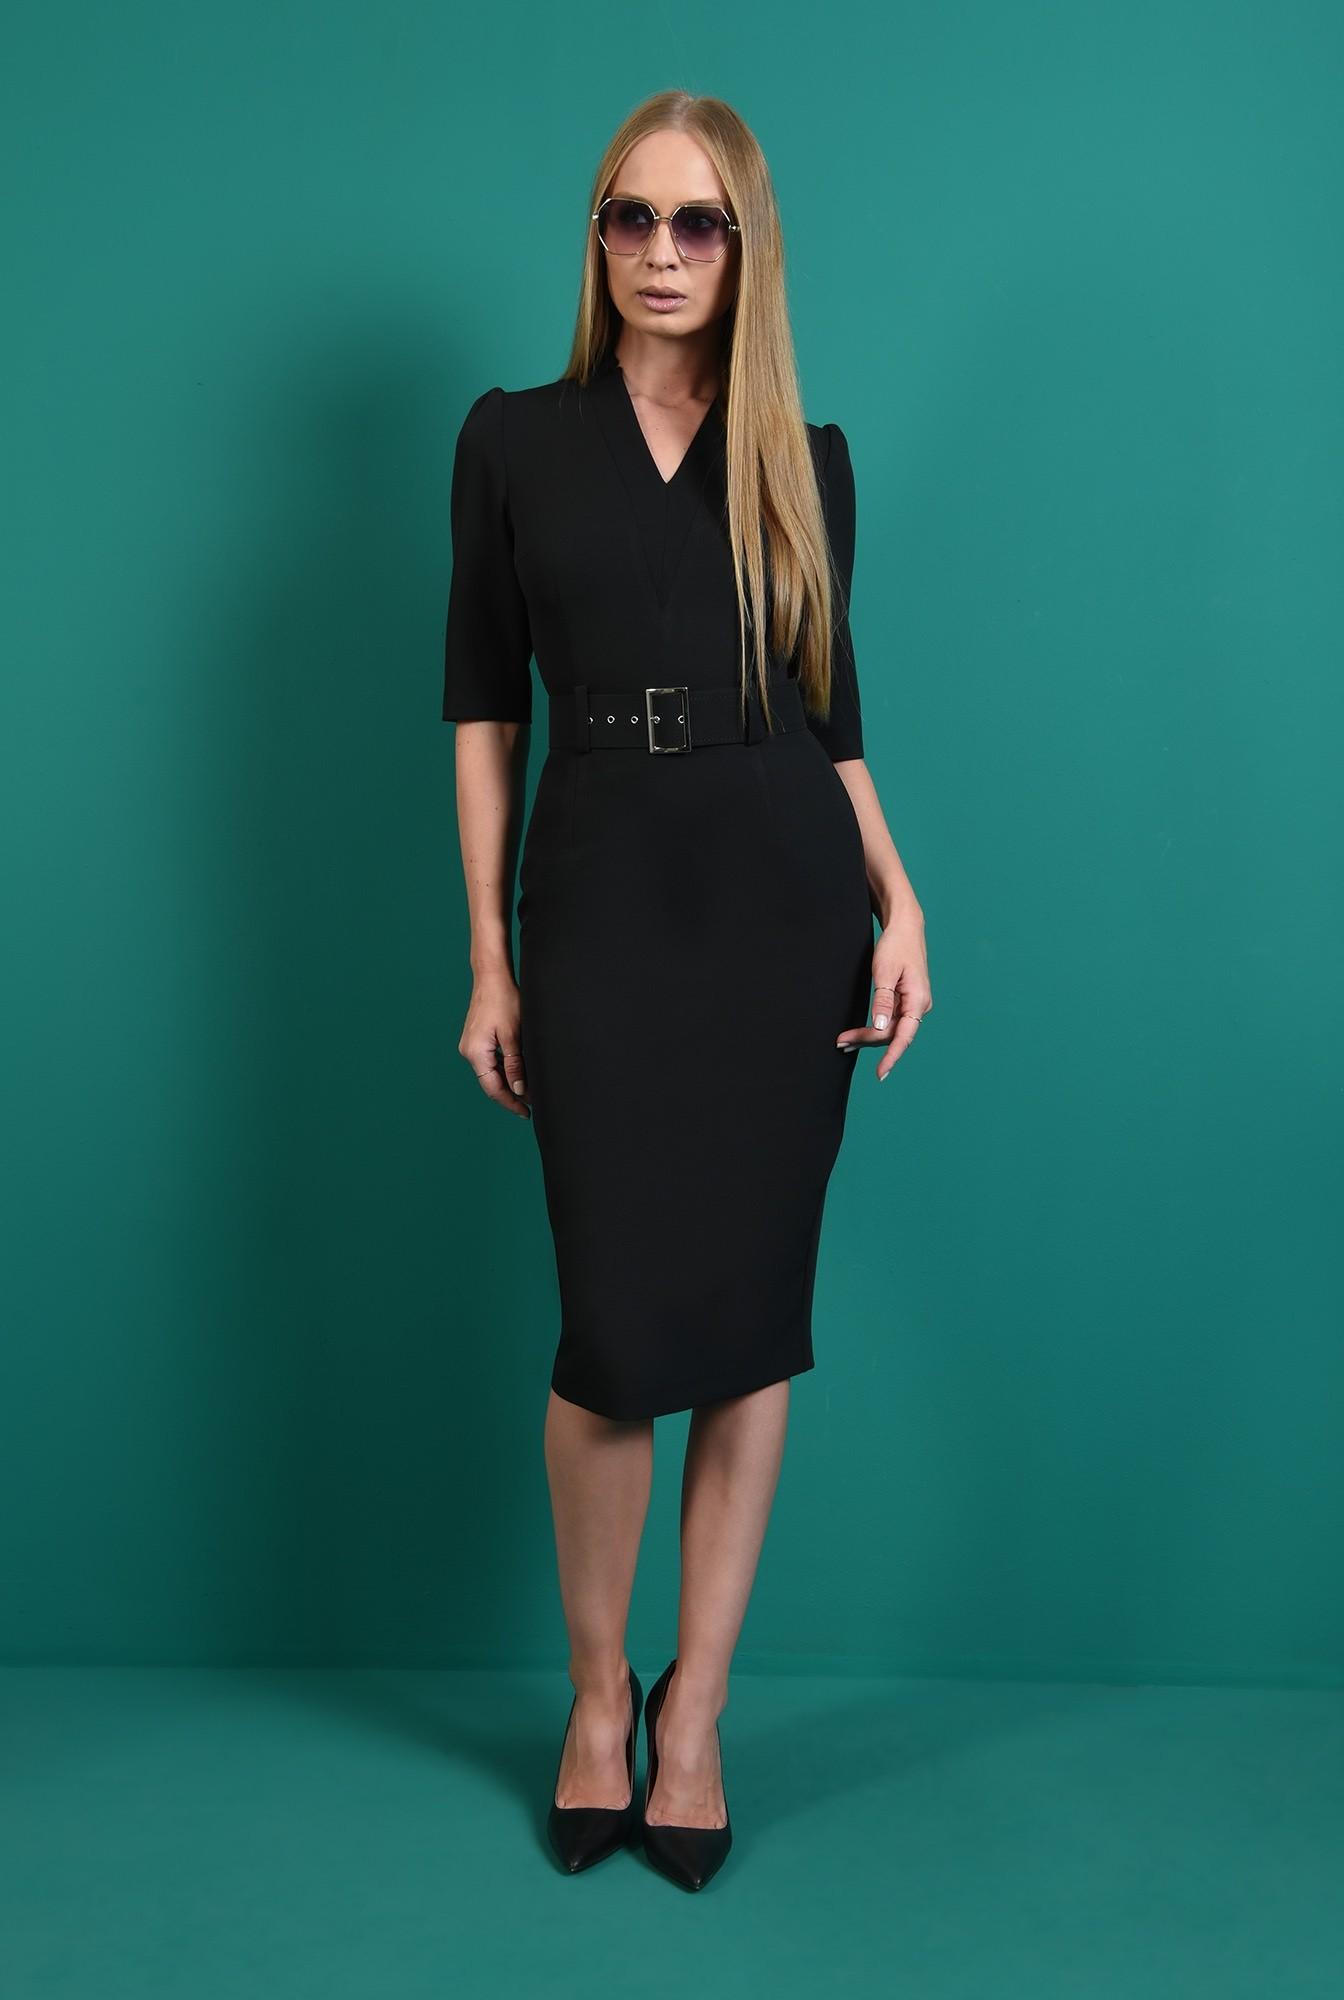 0 - rochie neagra, conica, cu revere crestate